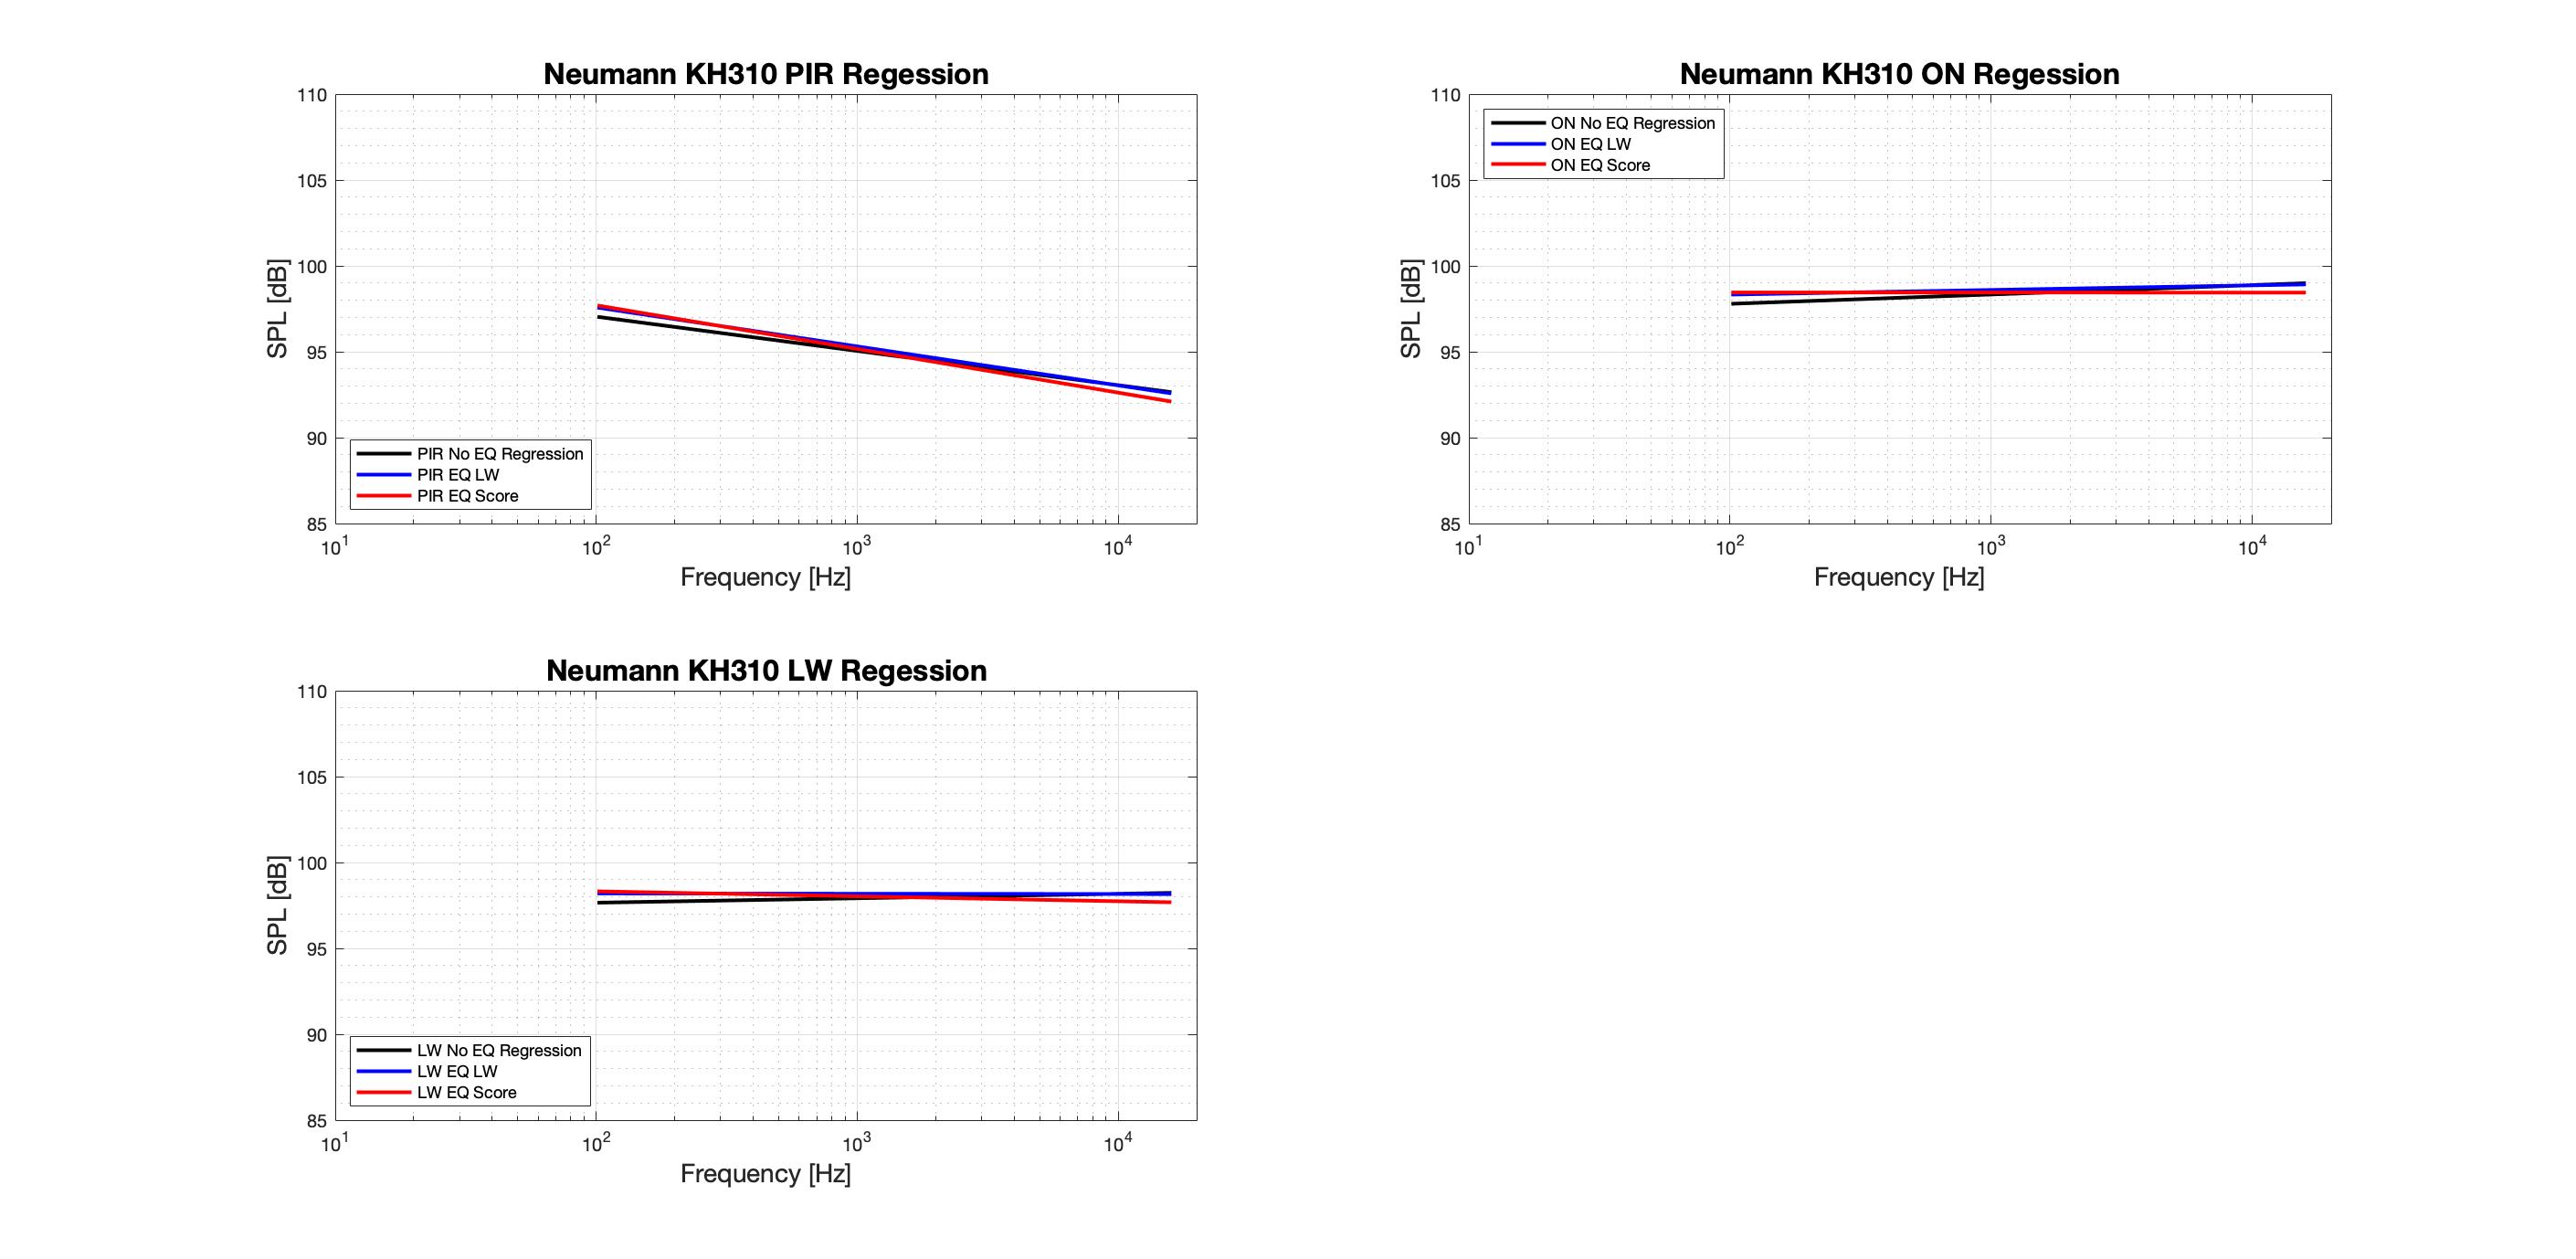 Neumann KH310 Regression-Tonal.png